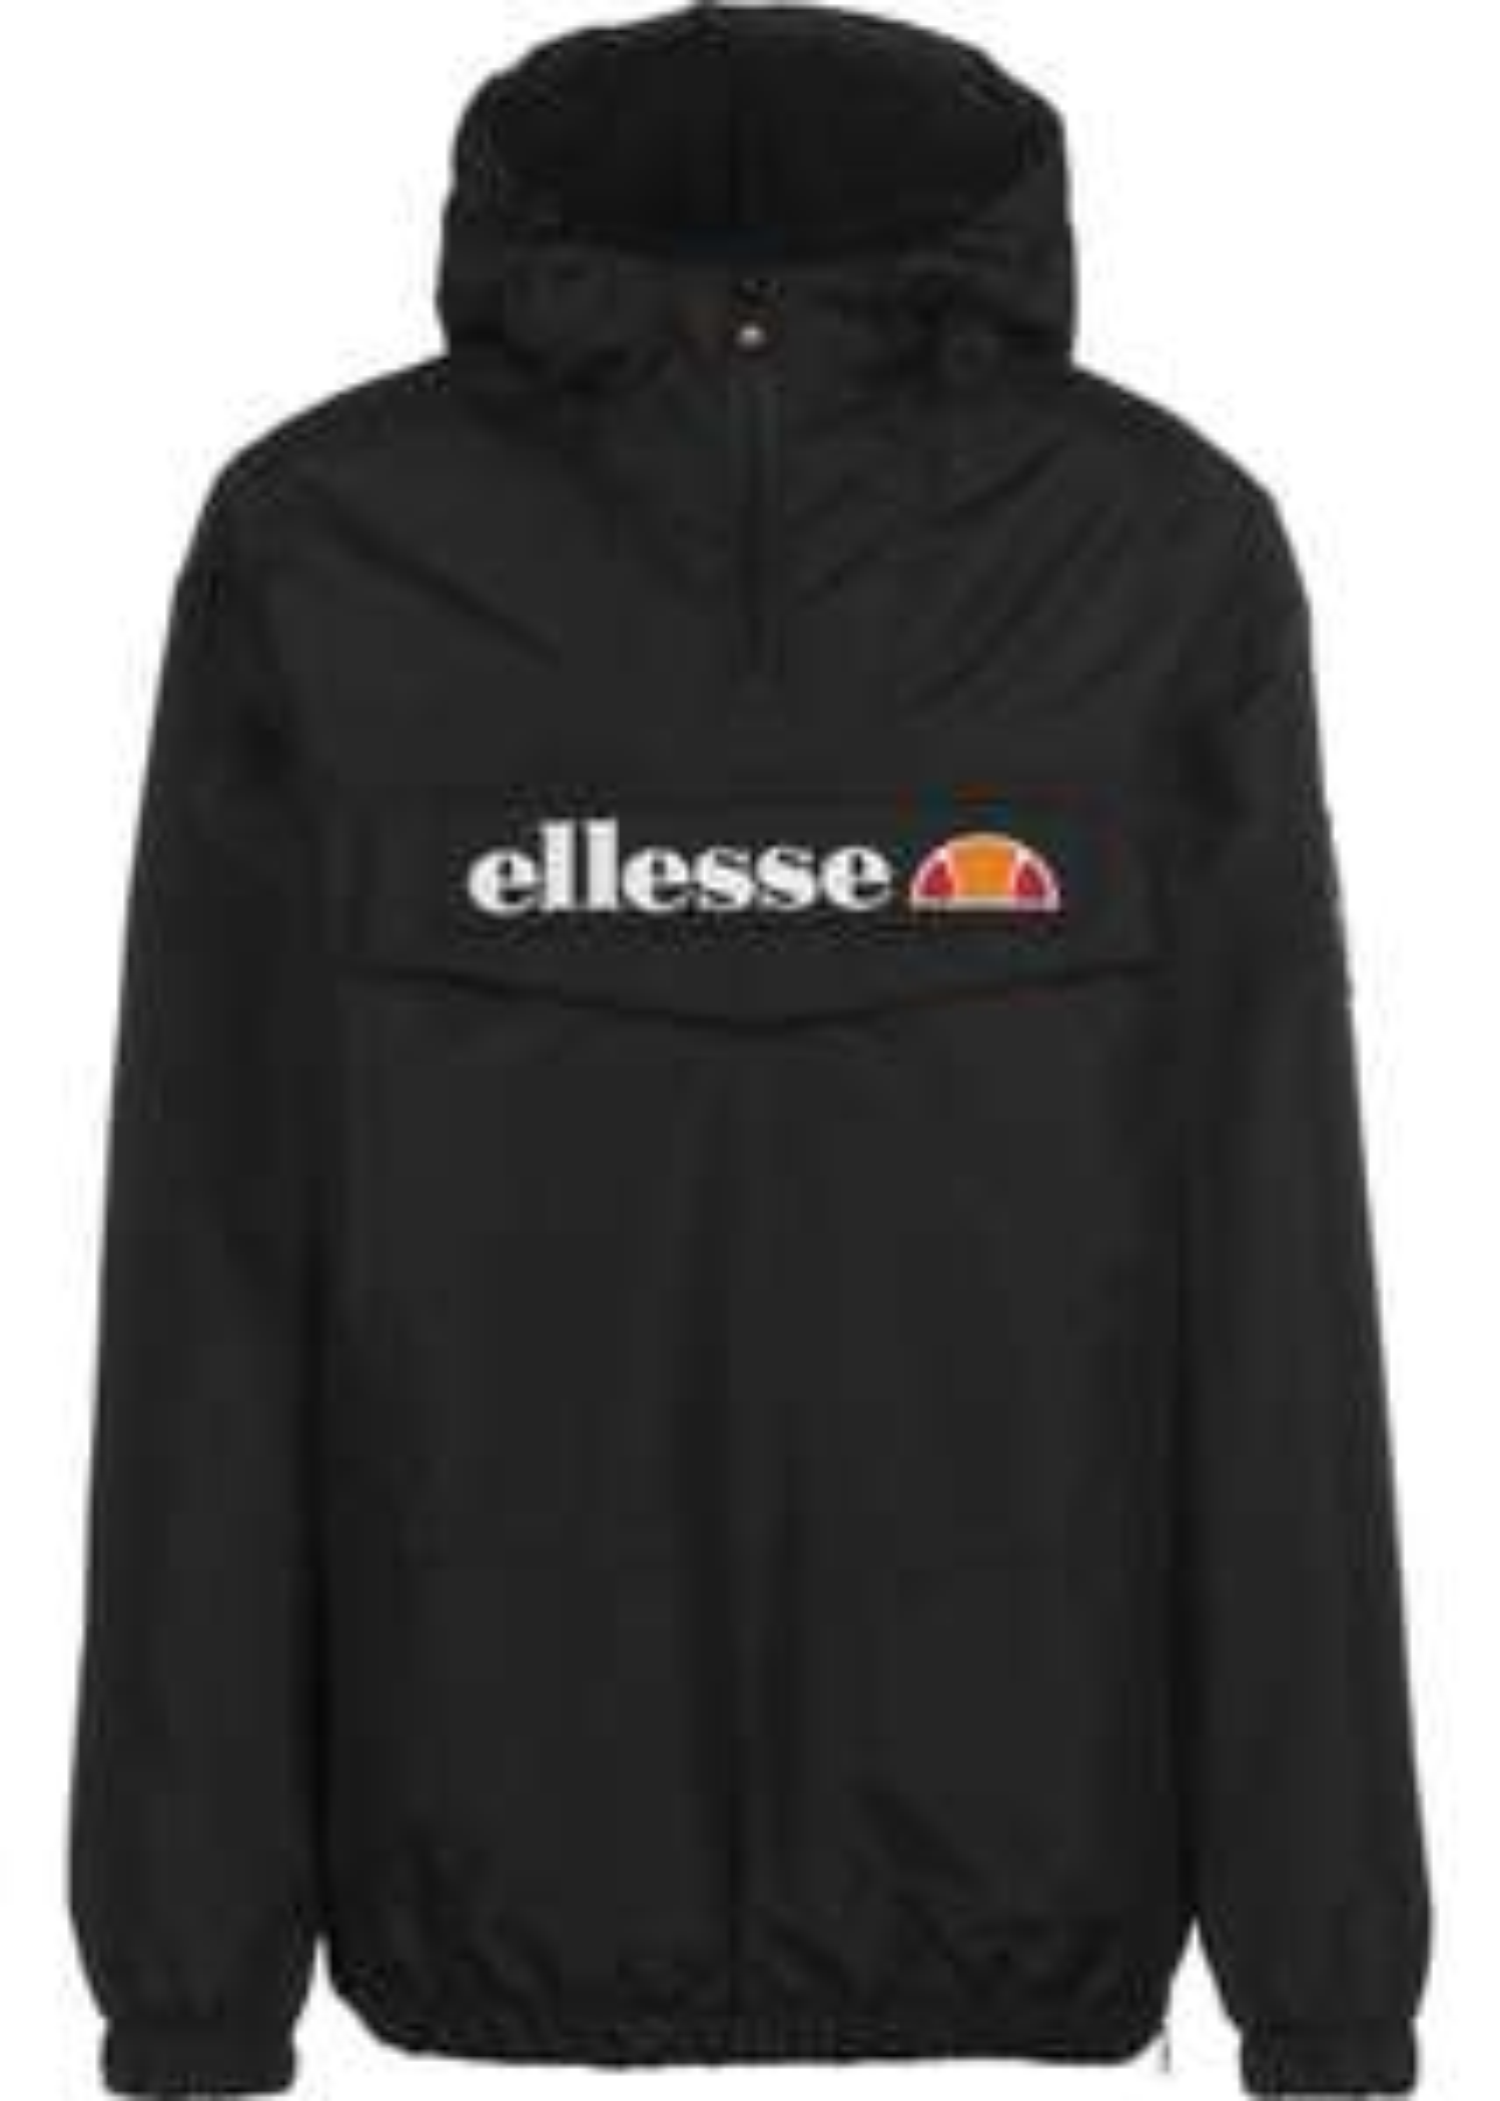 Ellesse Monterini Windbreaker (Größen XS bis L)